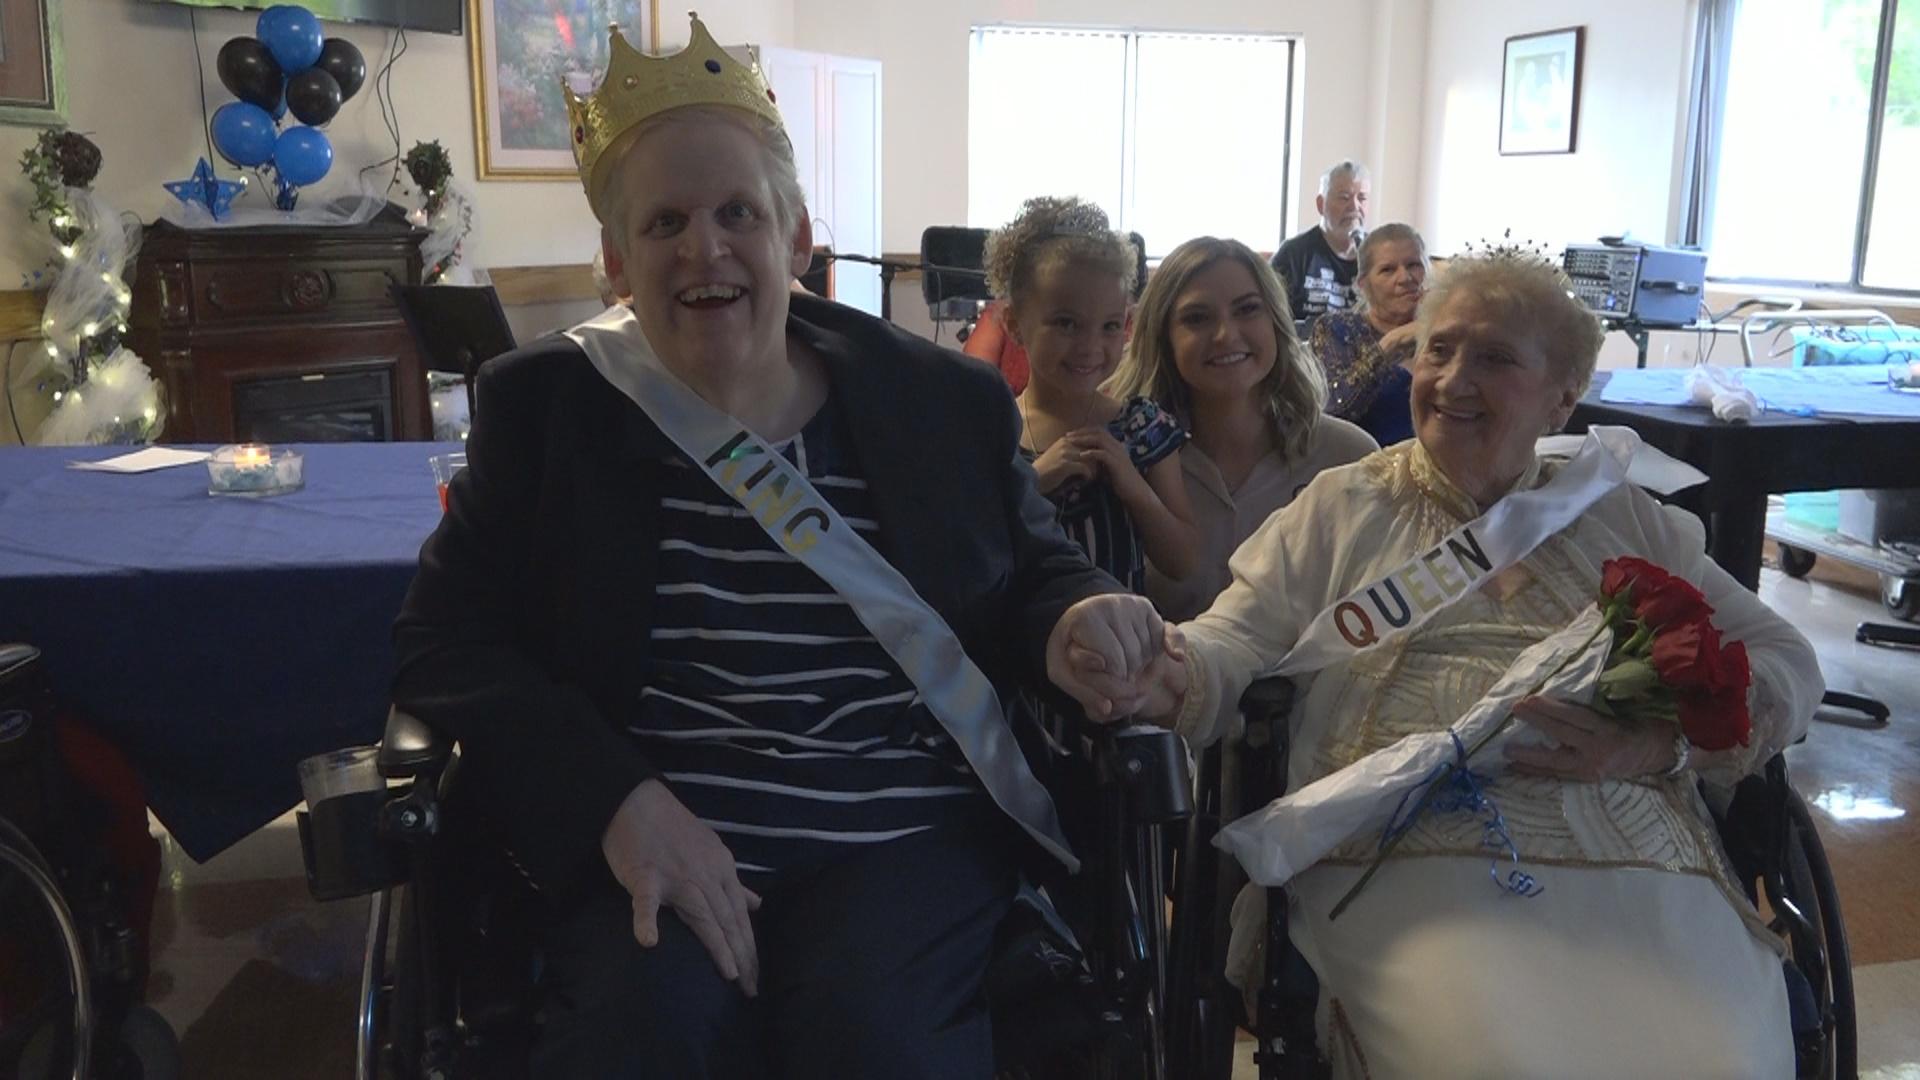 Clarksburg Nursing and Rehab Prom 2019_1558052830010.jpg.jpg